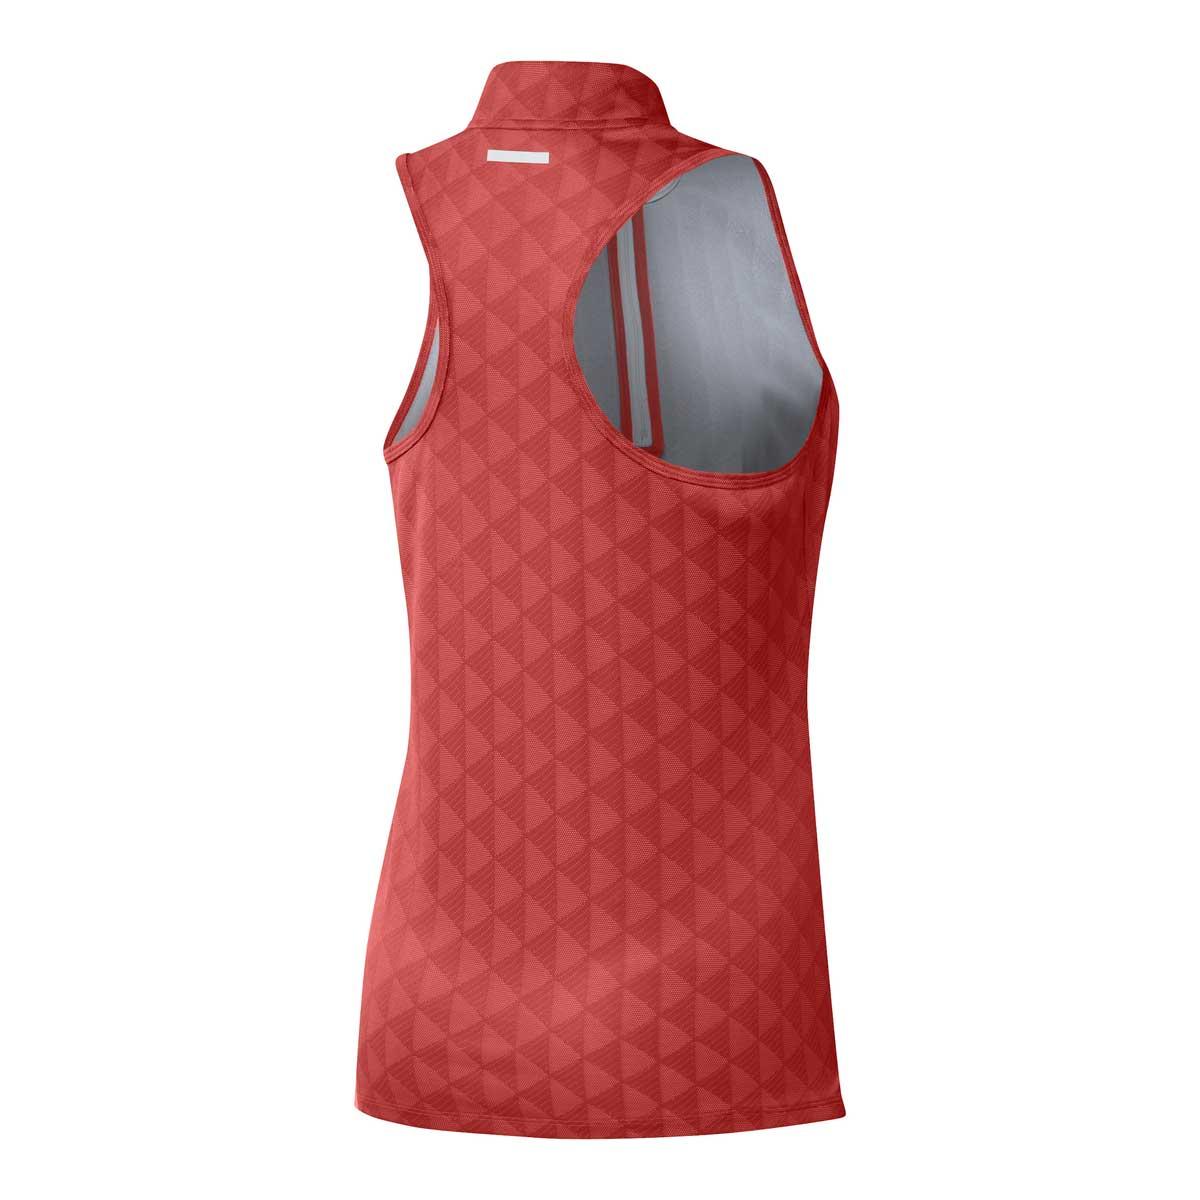 Adidas Women's Heat.RDY Zip Crew Red Sleeveless Polo